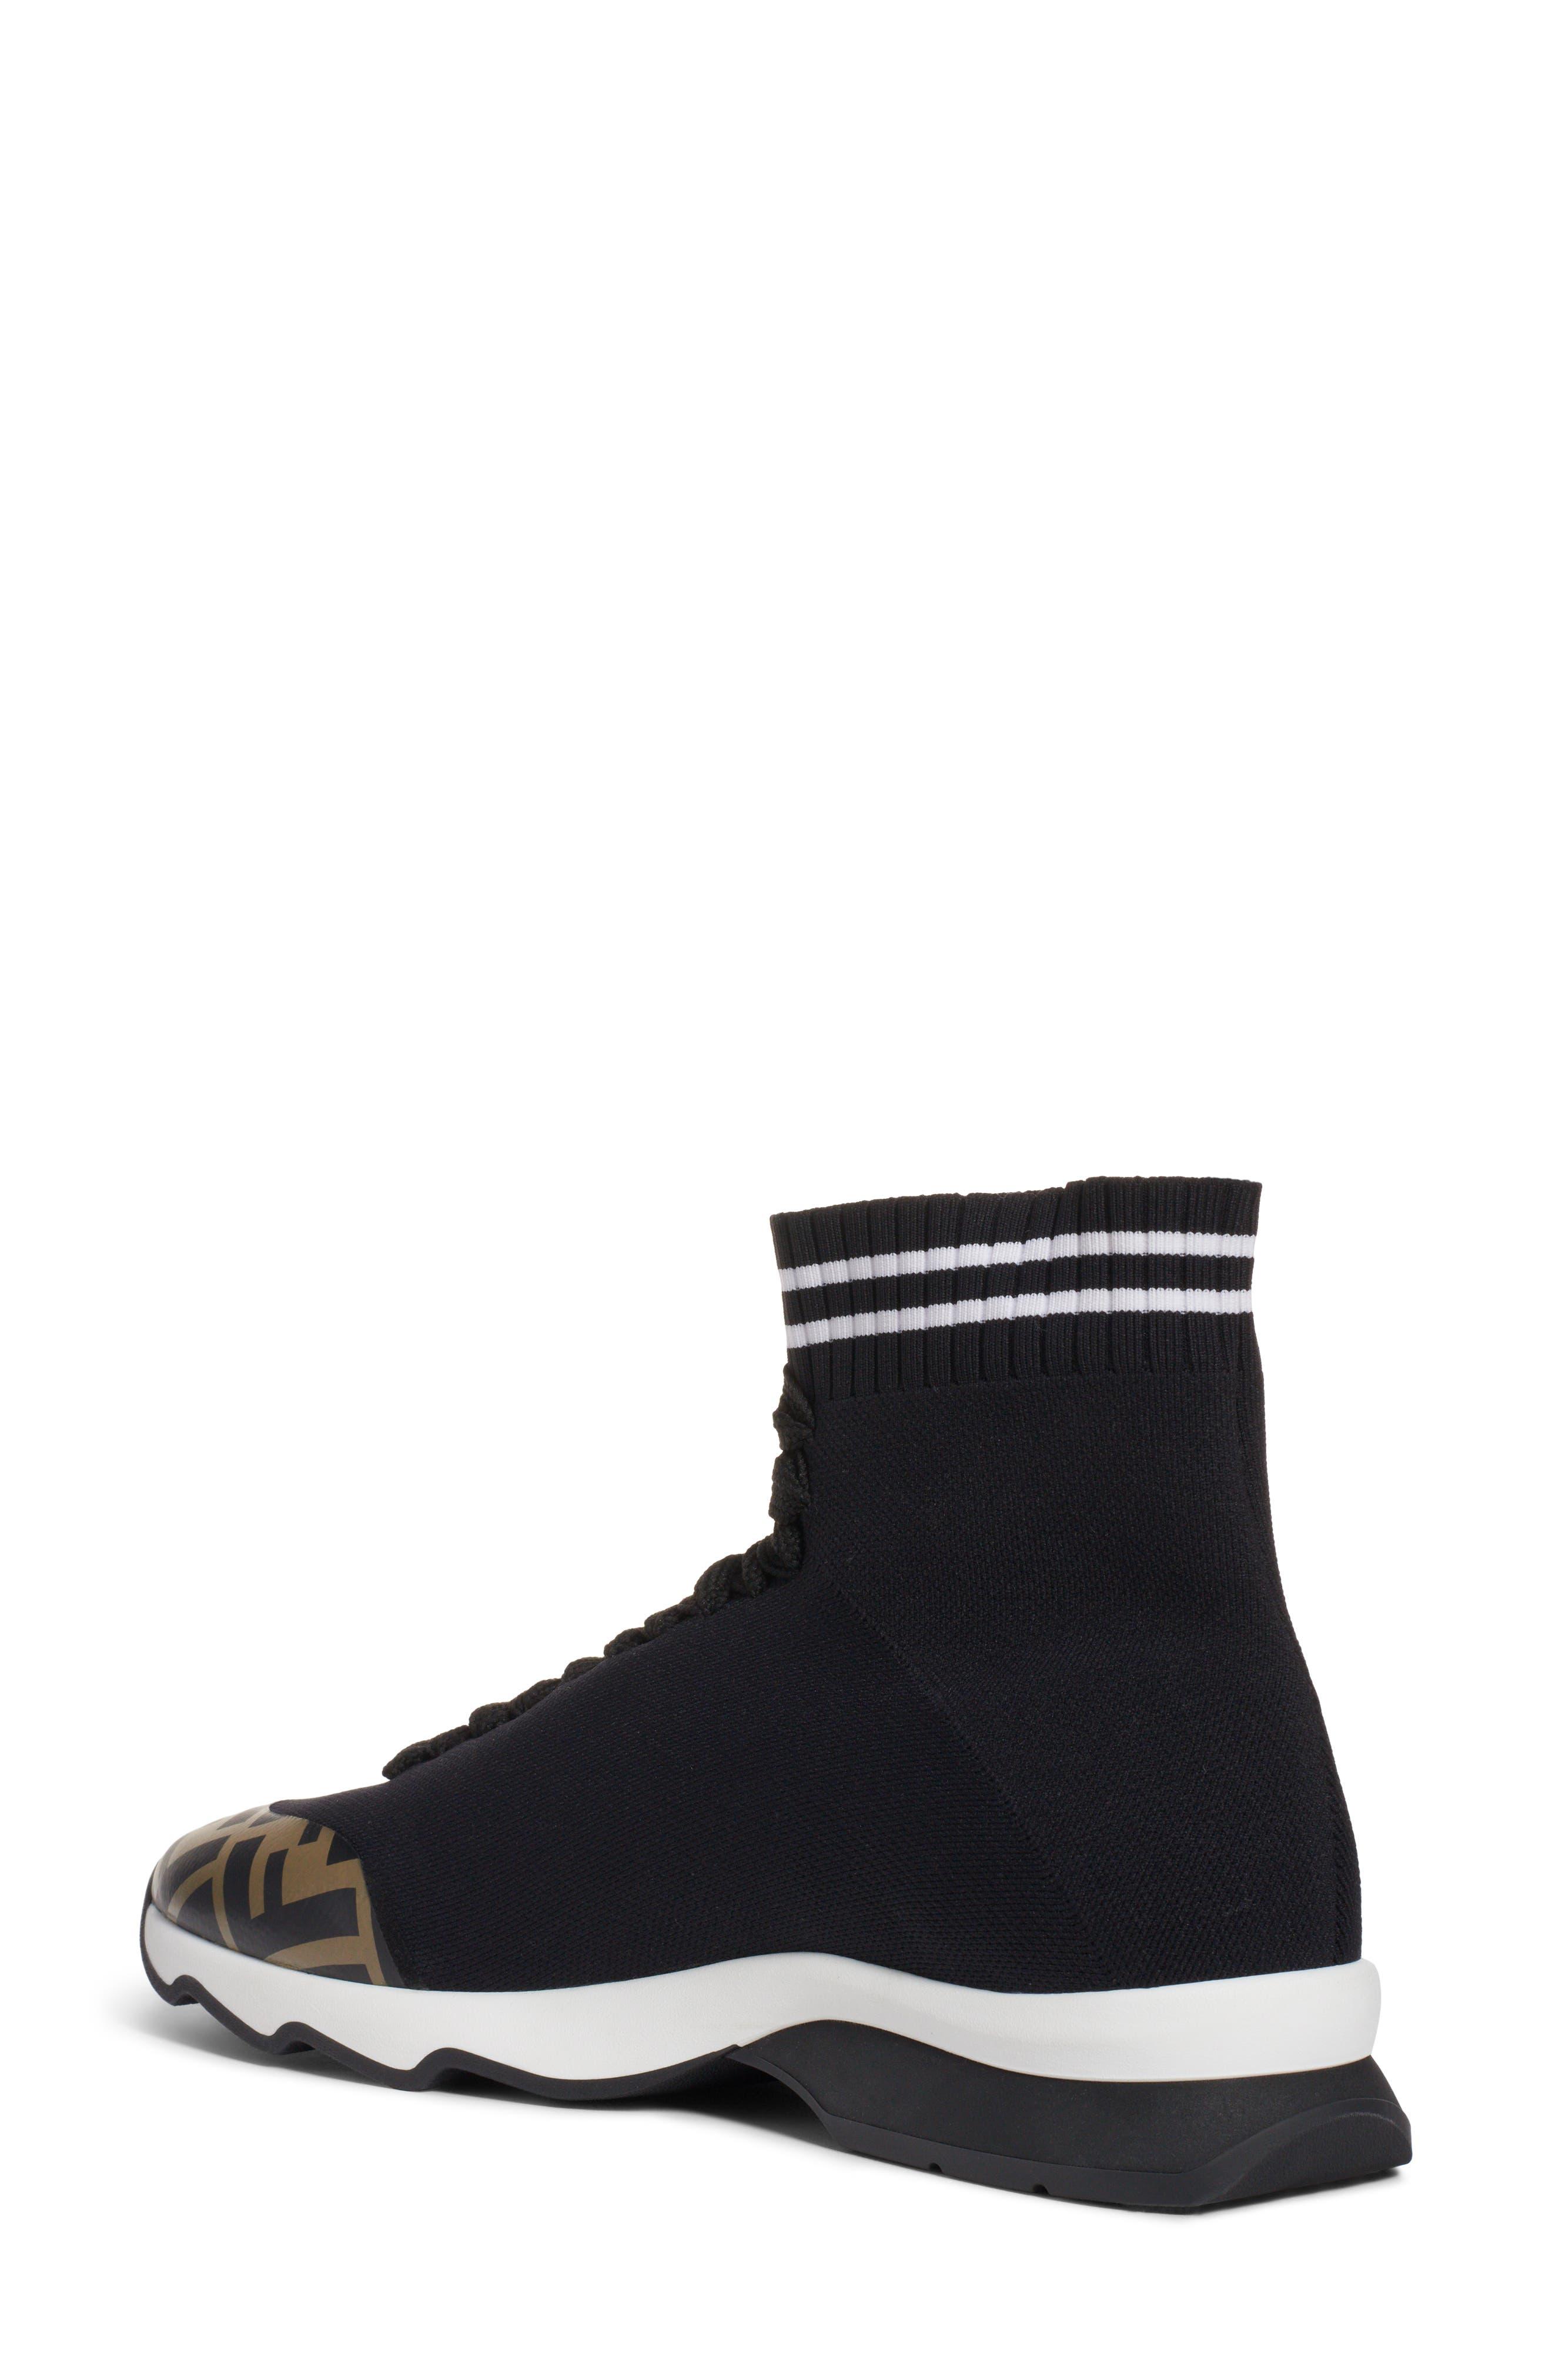 Rockotop Zucca Sock Sneaker,                             Alternate thumbnail 2, color,                             BLACK